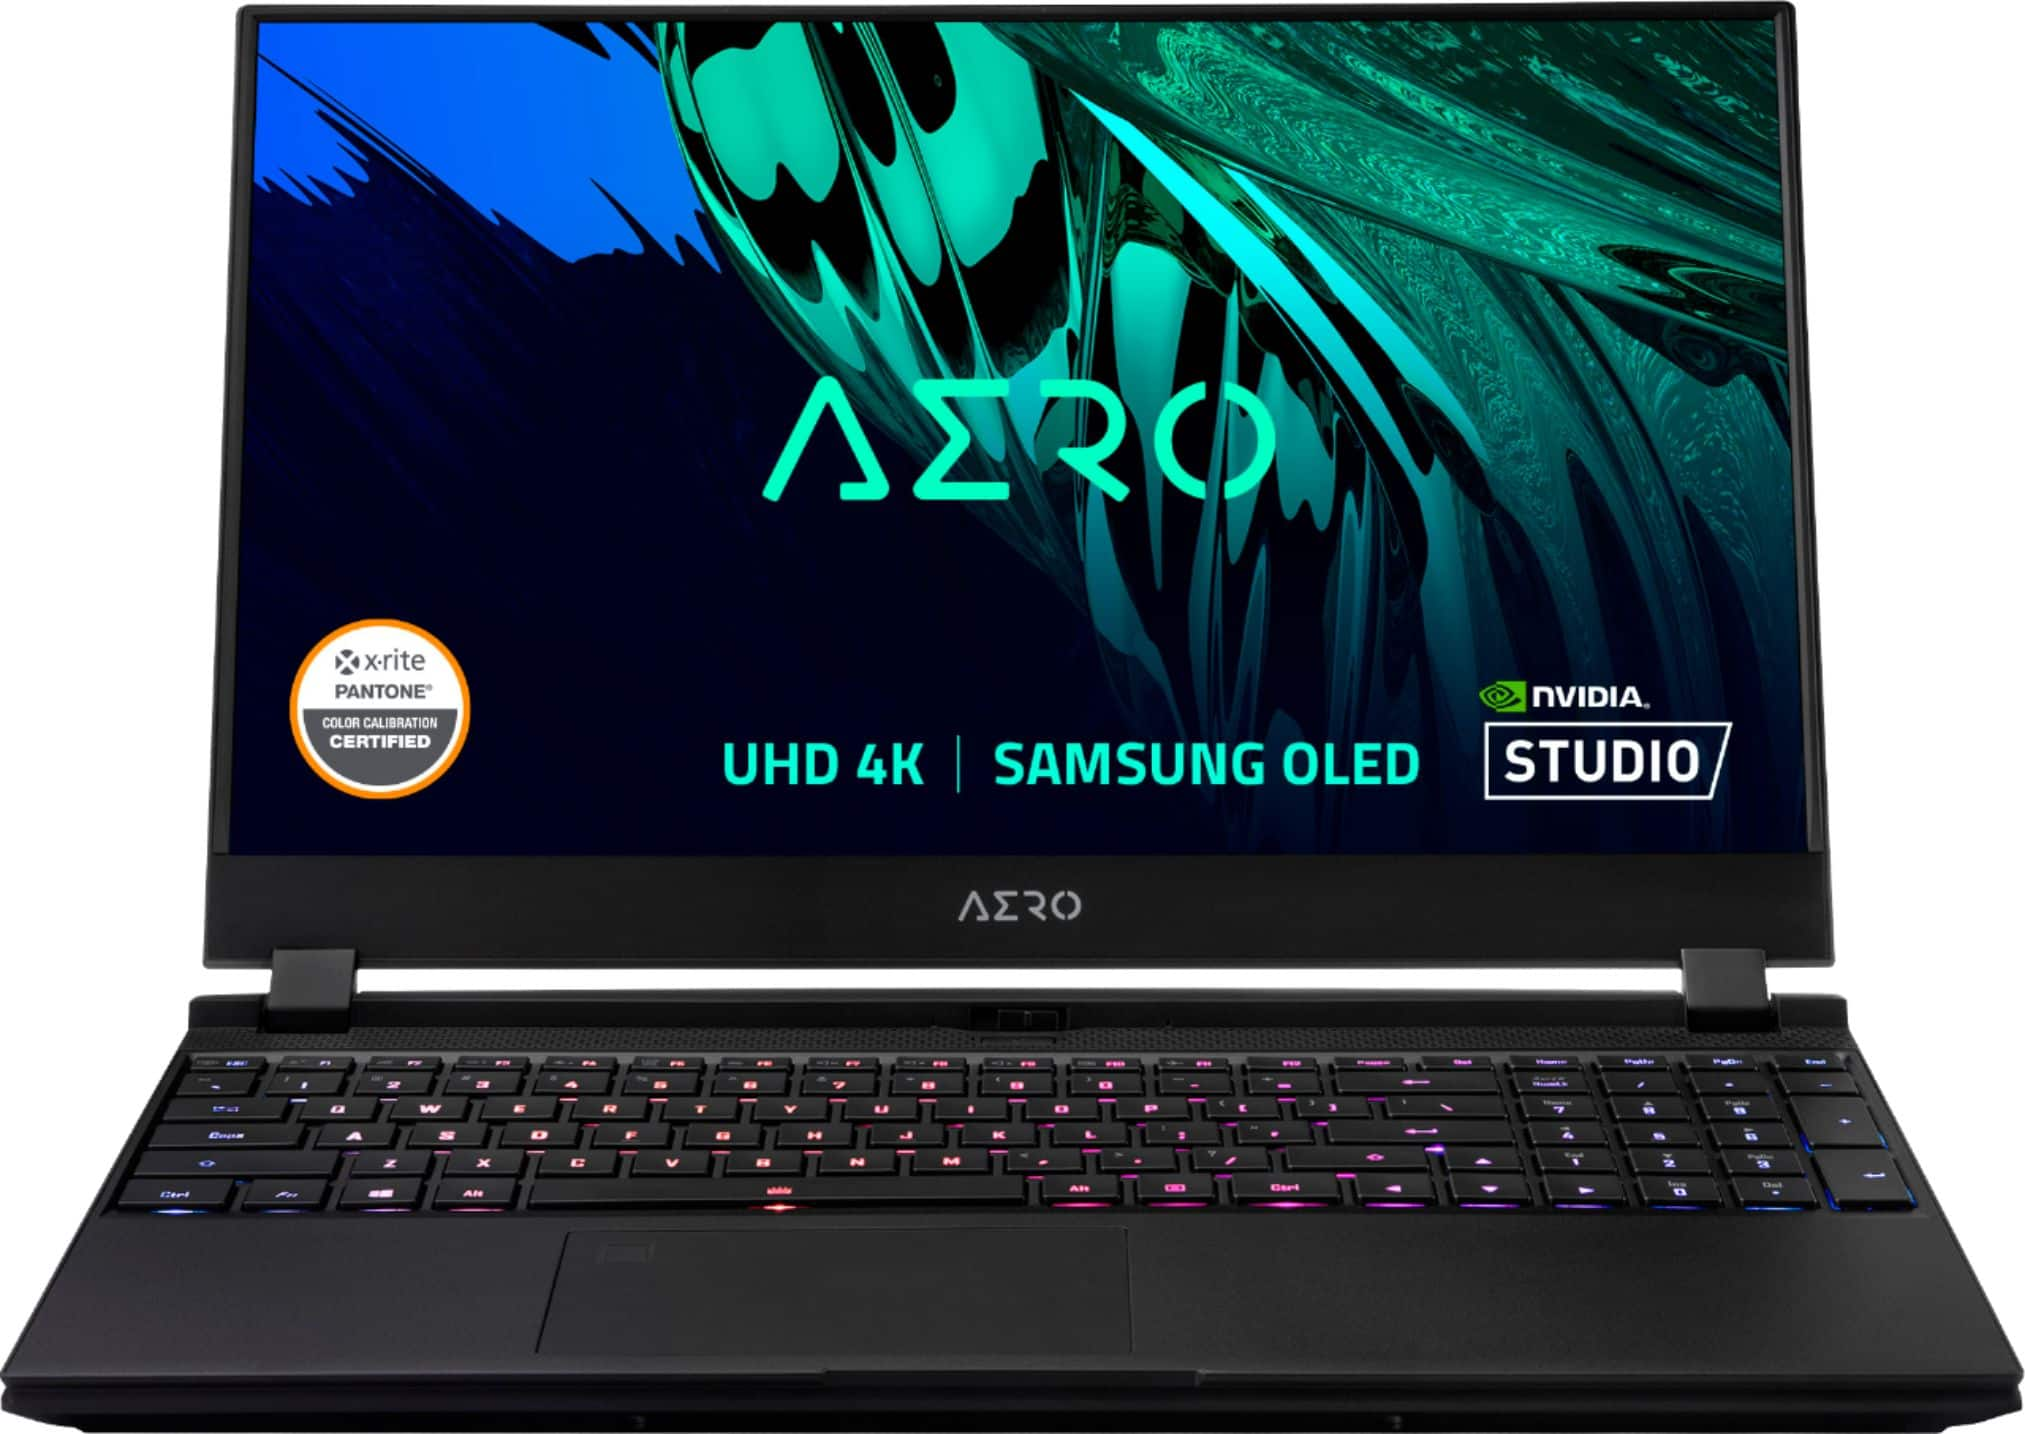 "GIGABYTE 15.6"" 4K OLED Creator Laptop Intel Core i7-11800H 16GB NVIDIA GeForce RTX 3060 1TB SSD AERO 15 OLED KD-72US624SP - Best Buy $1299.99"